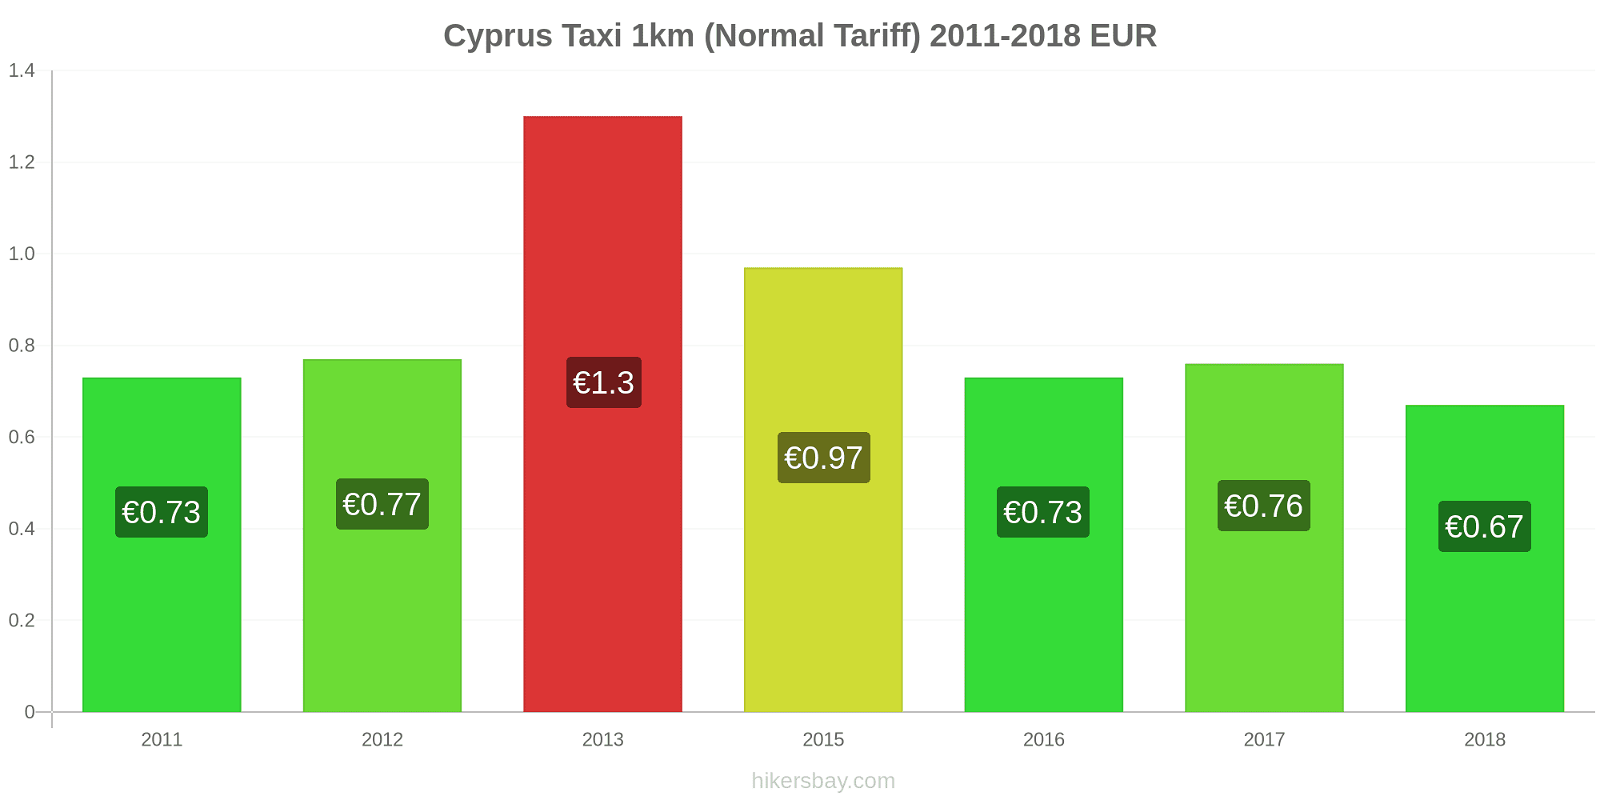 Cyprus price changes Taxi 1km (Normal Tariff) hikersbay.com